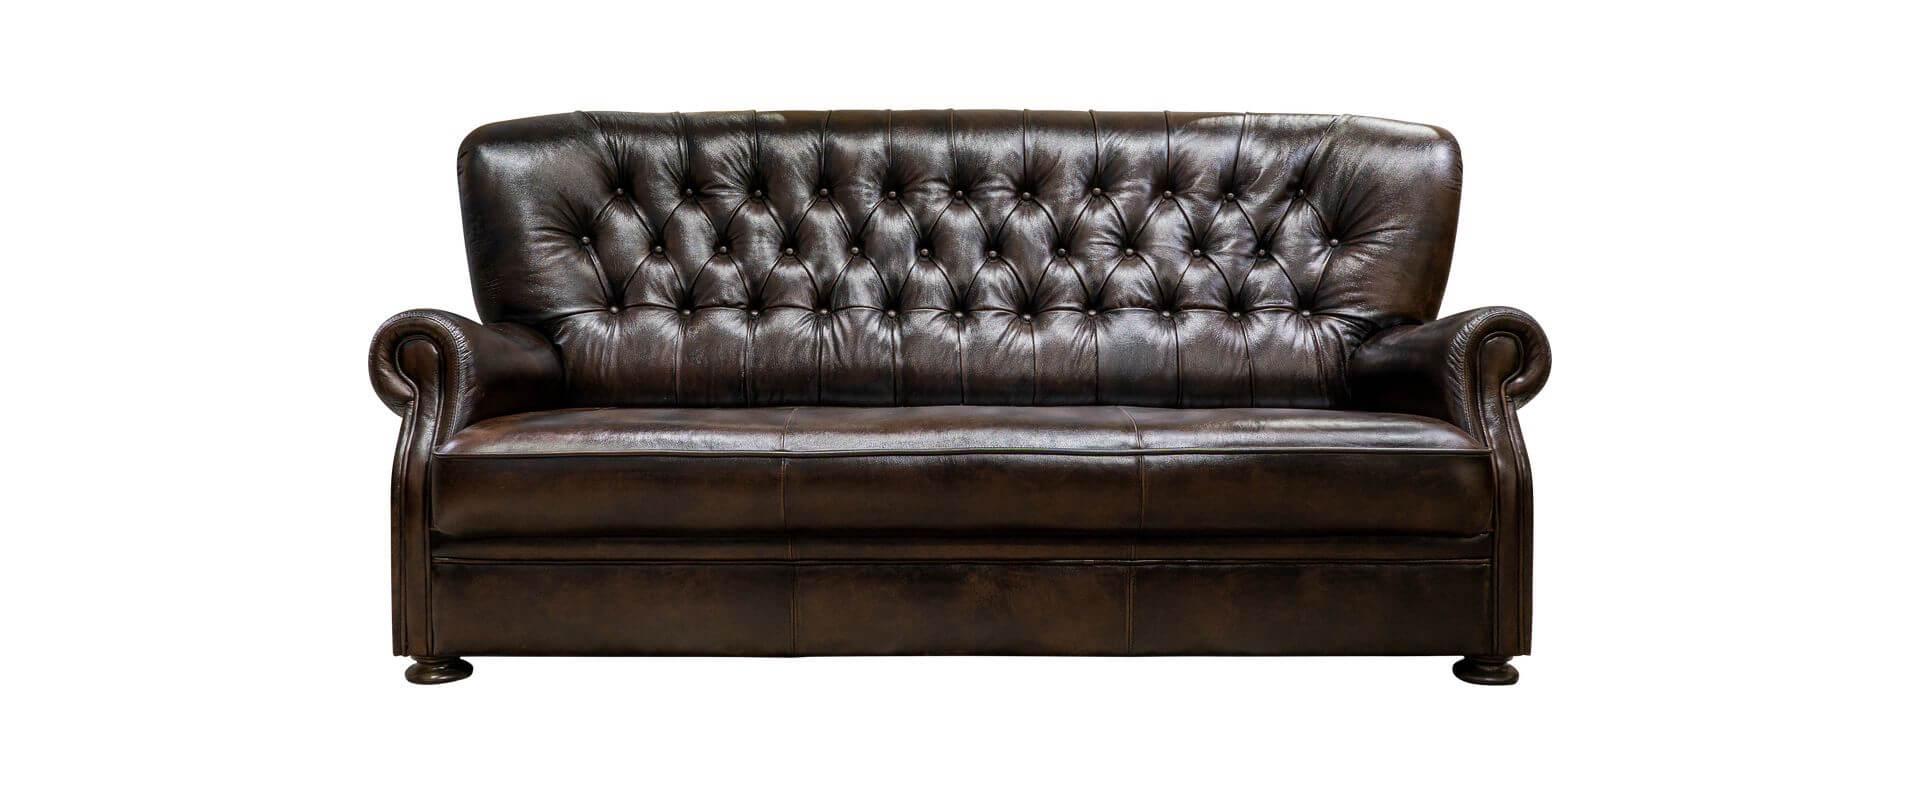 Rochester chesterfield bőr kanapé